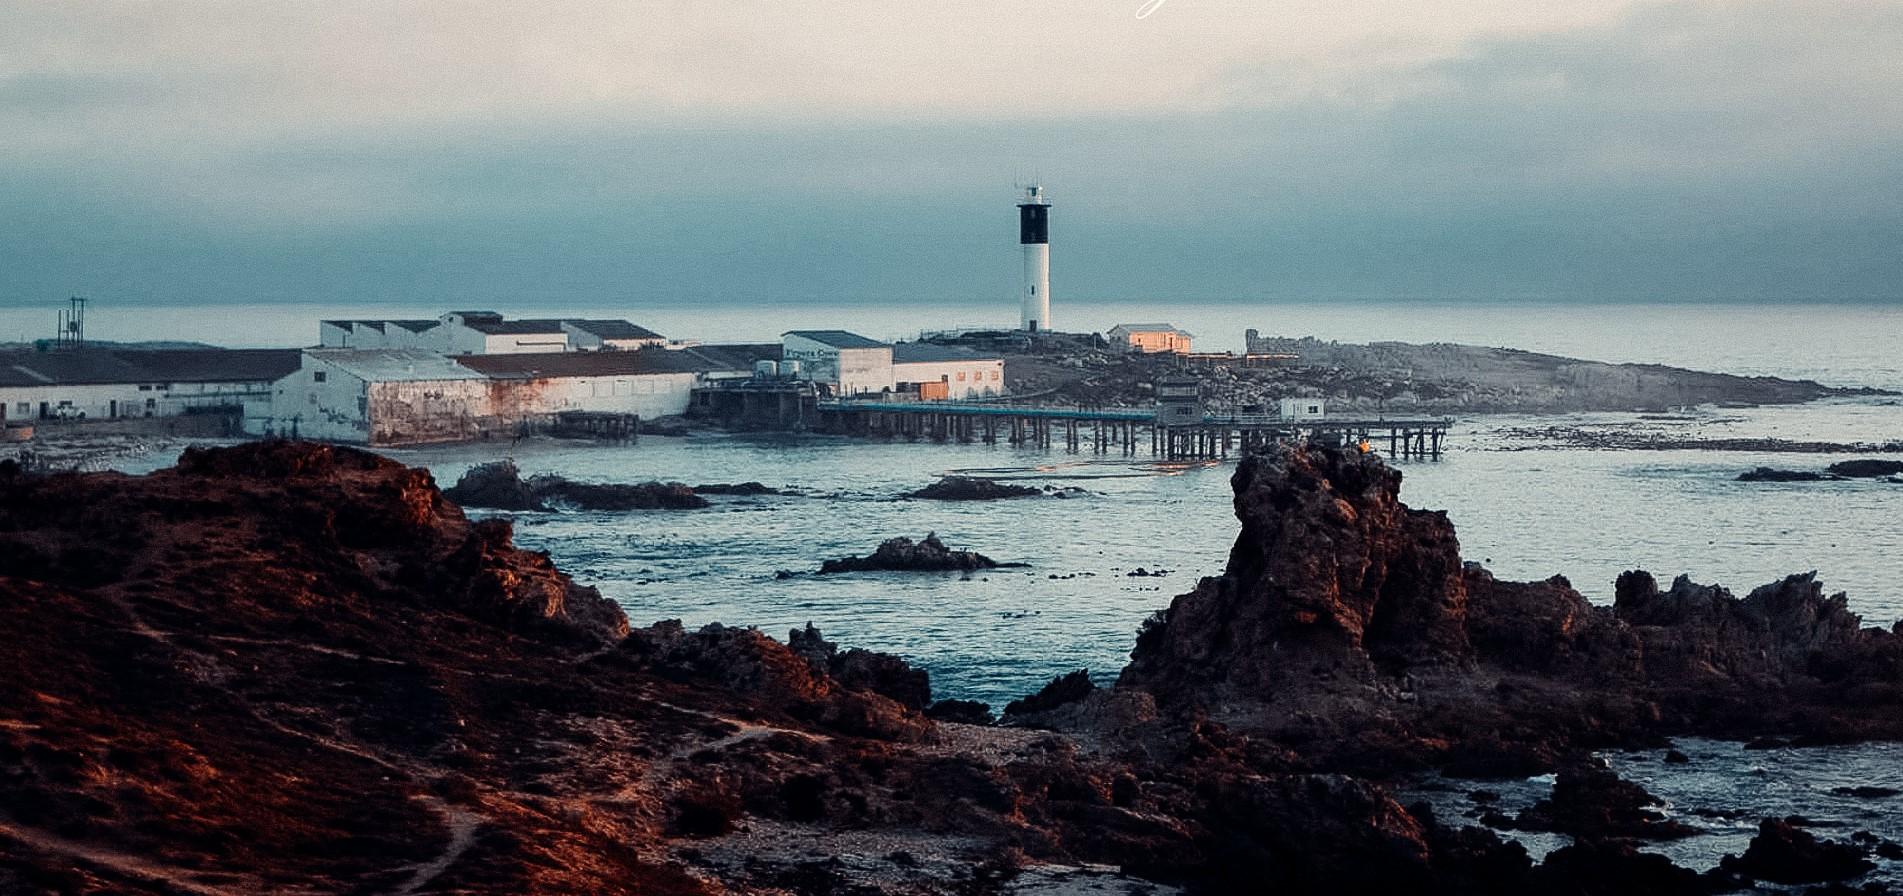 DGB Acquires unique Fryers Cove Winery on the Cape West Coast photo